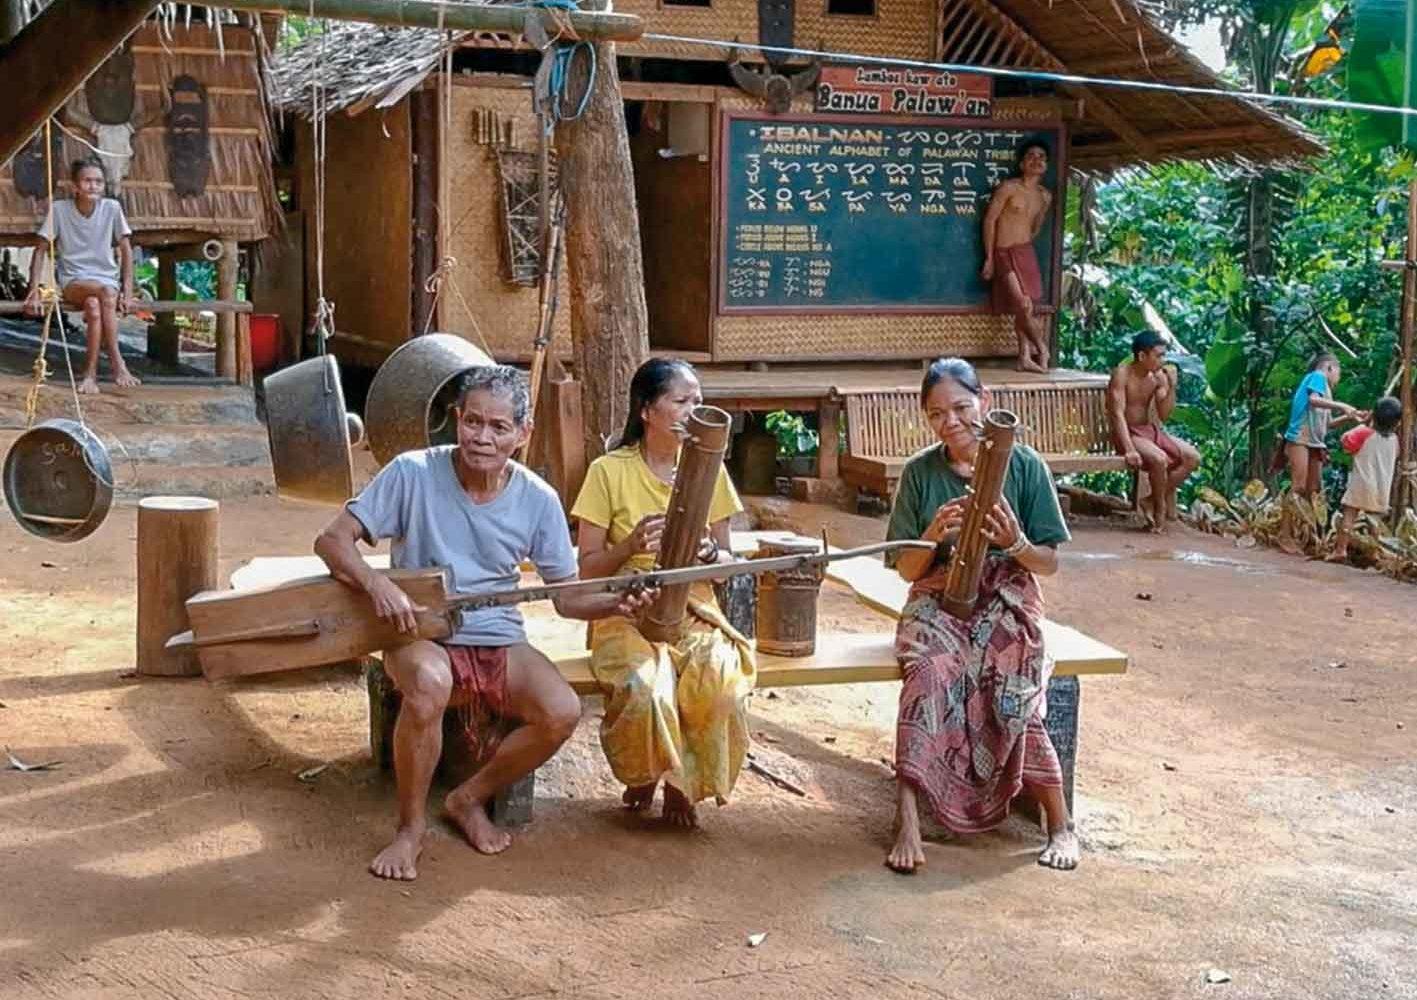 Musikgruppe auf Palawan, Philippinen